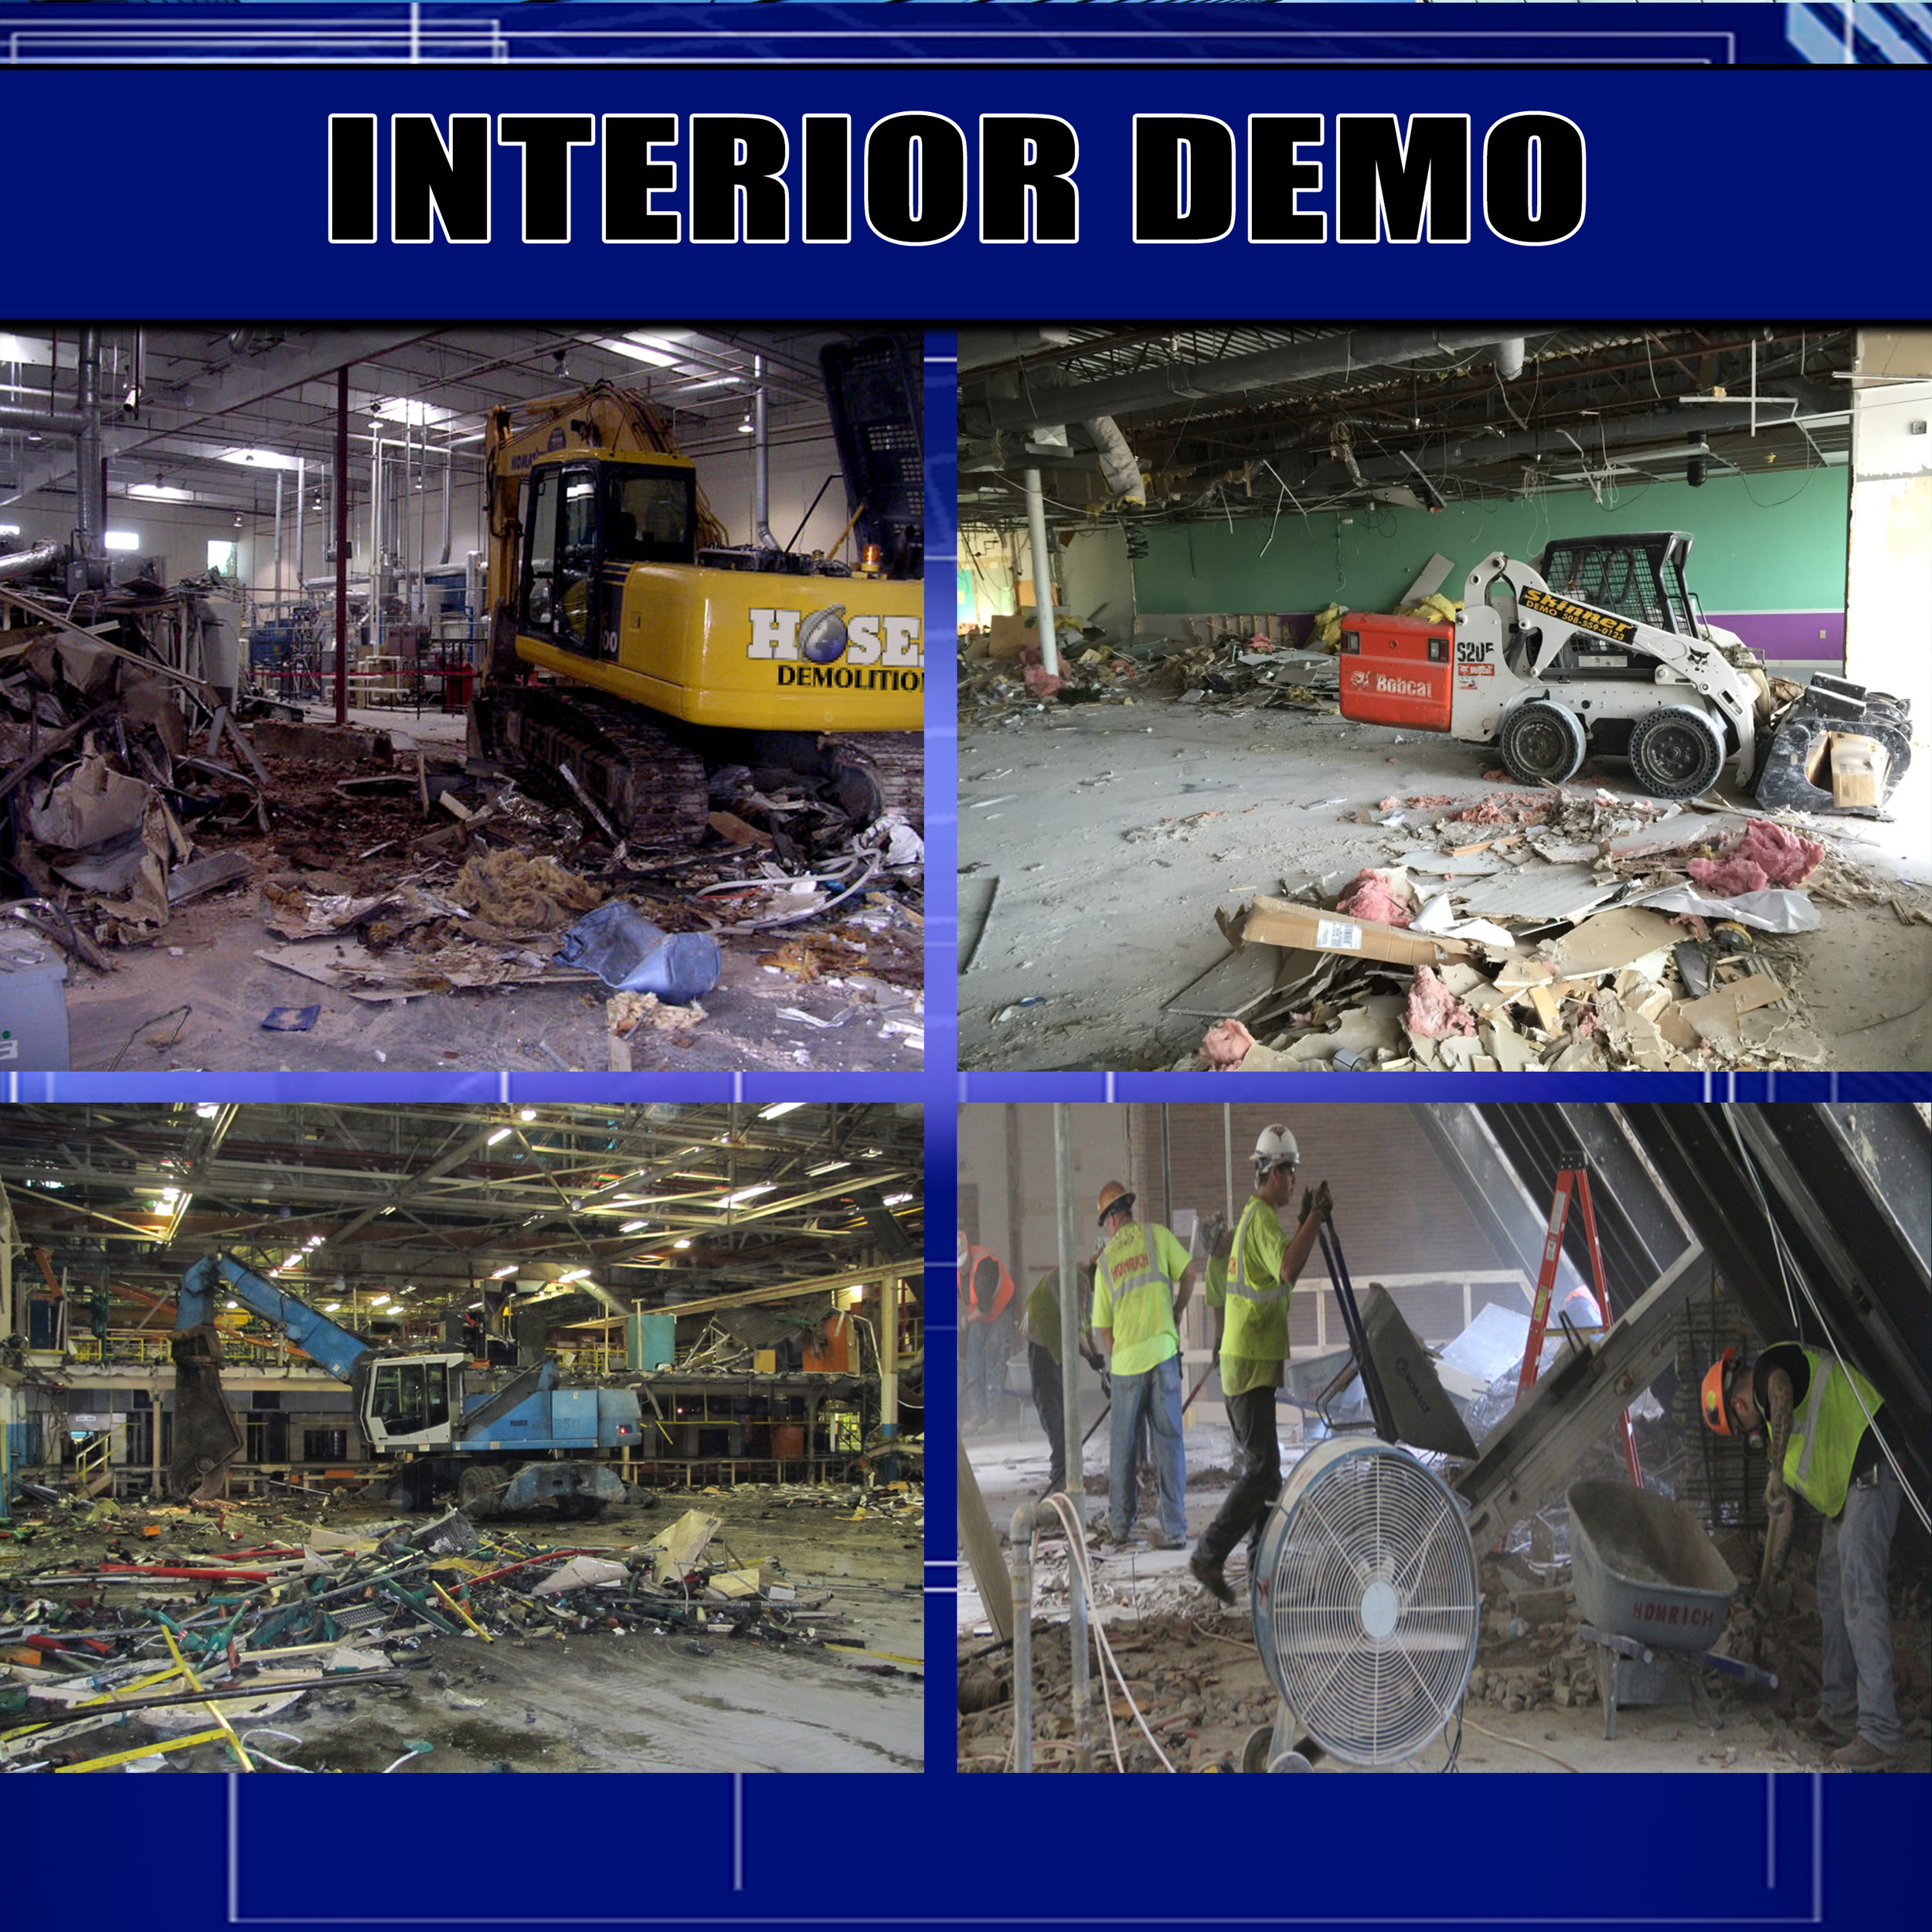 4_InteriorDemo.jpg